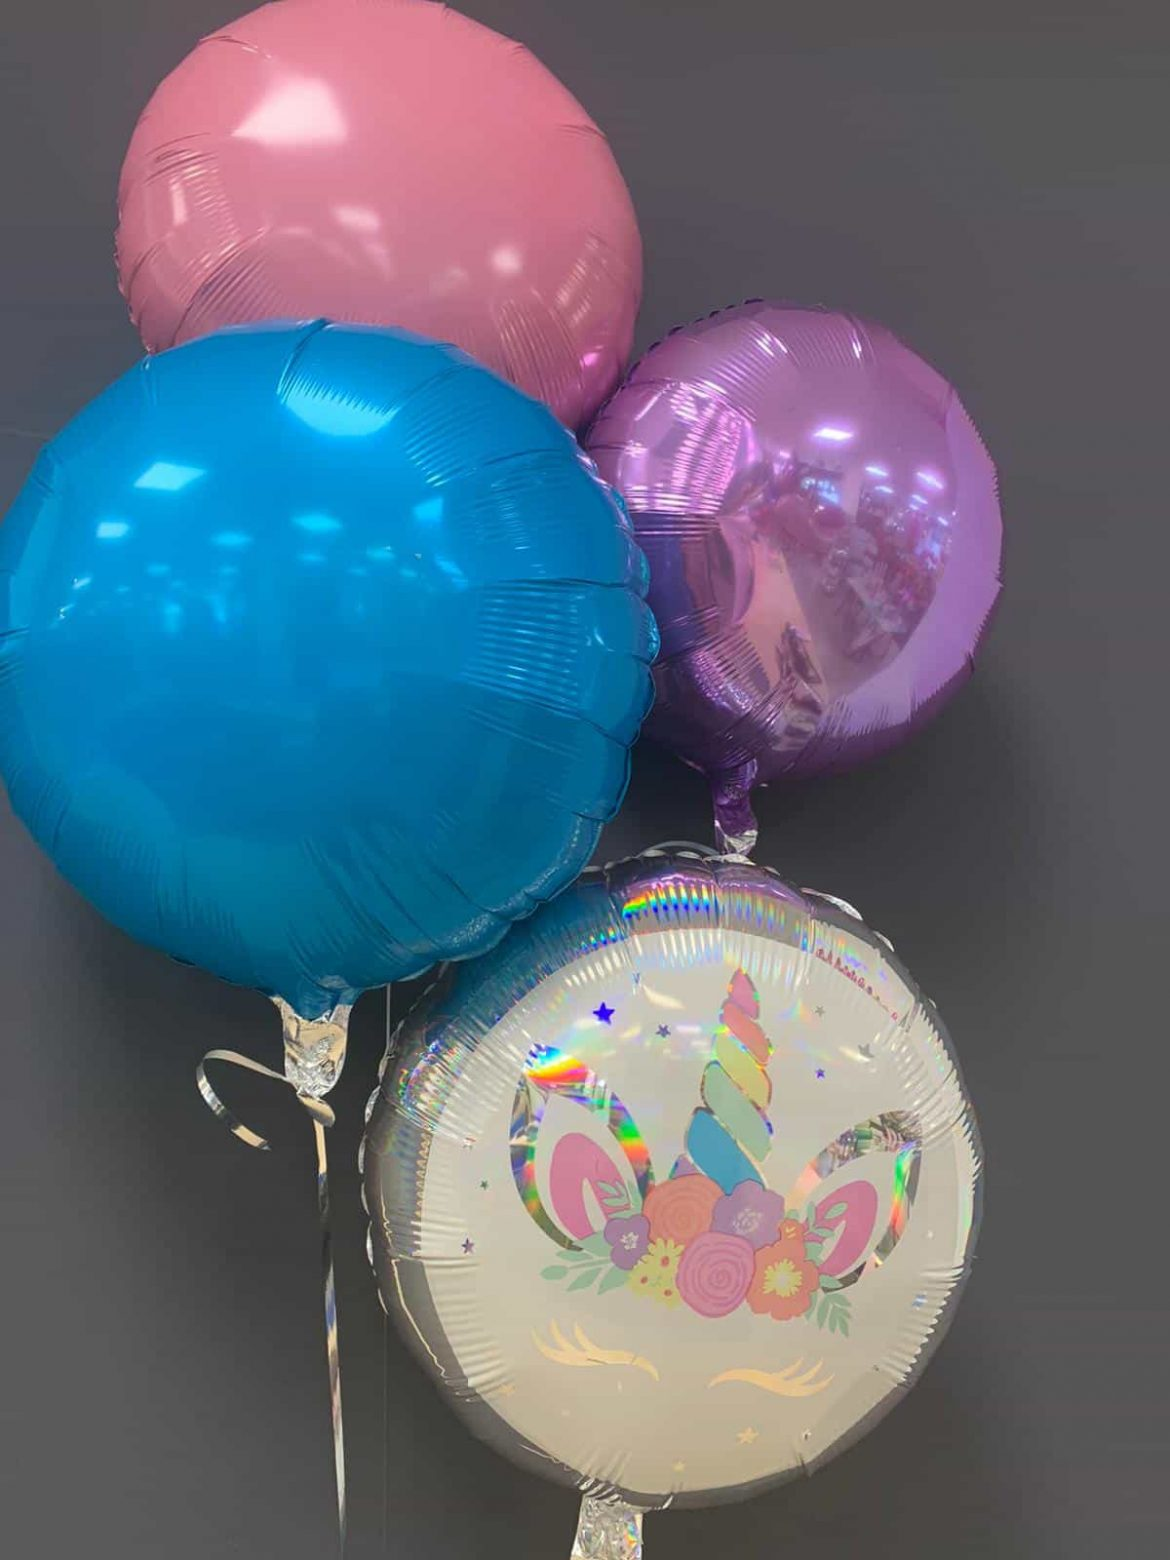 Einhornballon € 5,50 mit Dekoballons in blau, rosa, lila je € 4,50 1